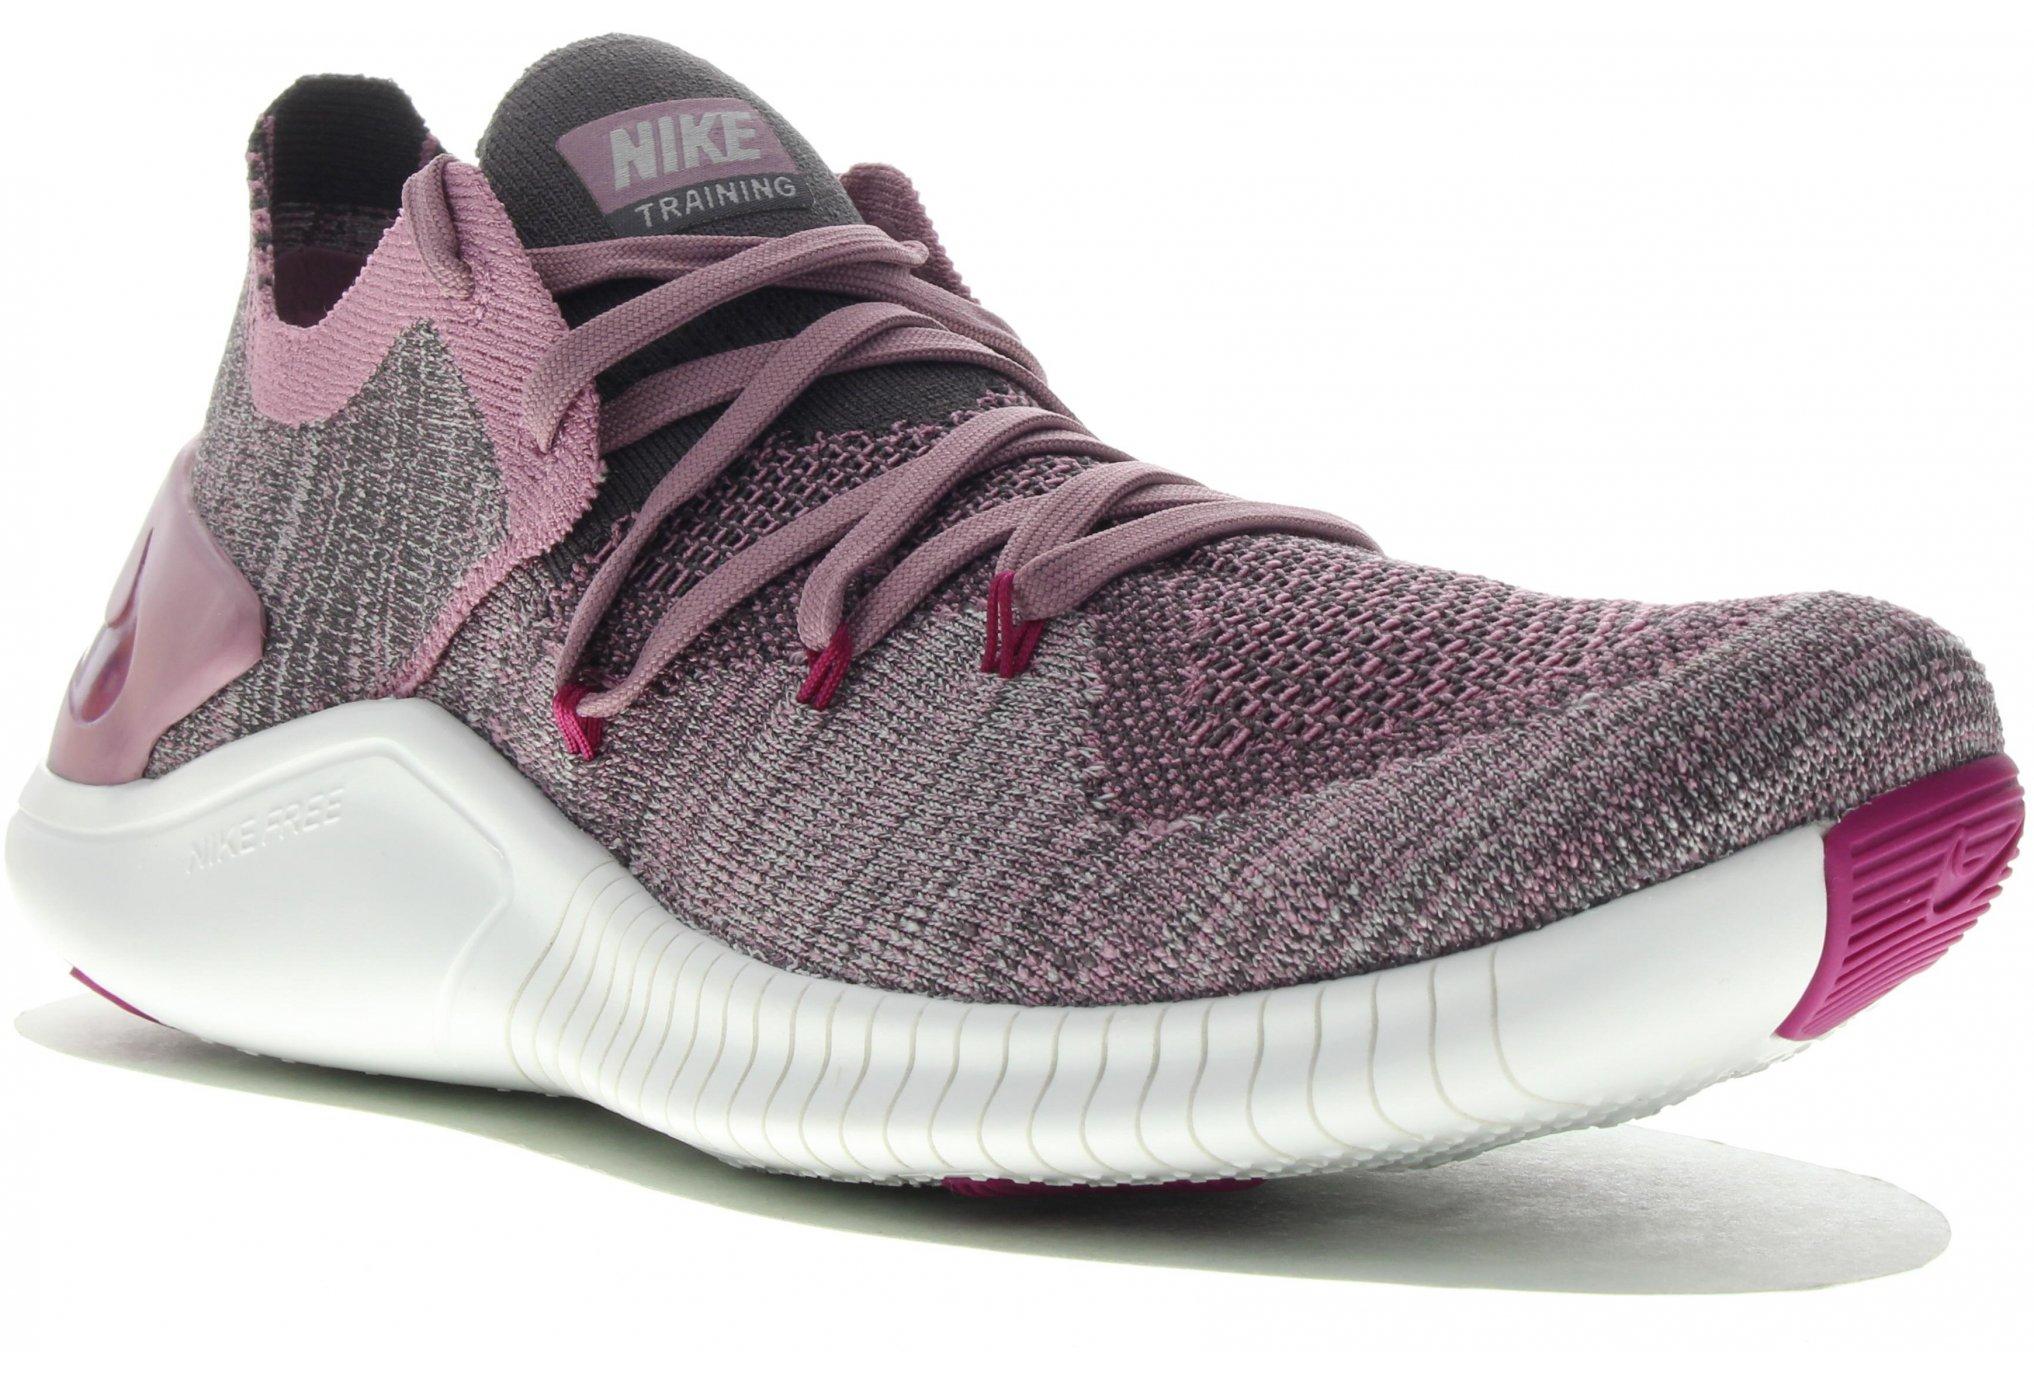 detailed look c38b6 aa860 Découvrez prochainement la collection Nike Free 2019 sur i-Run.fr   NIKE  FREE